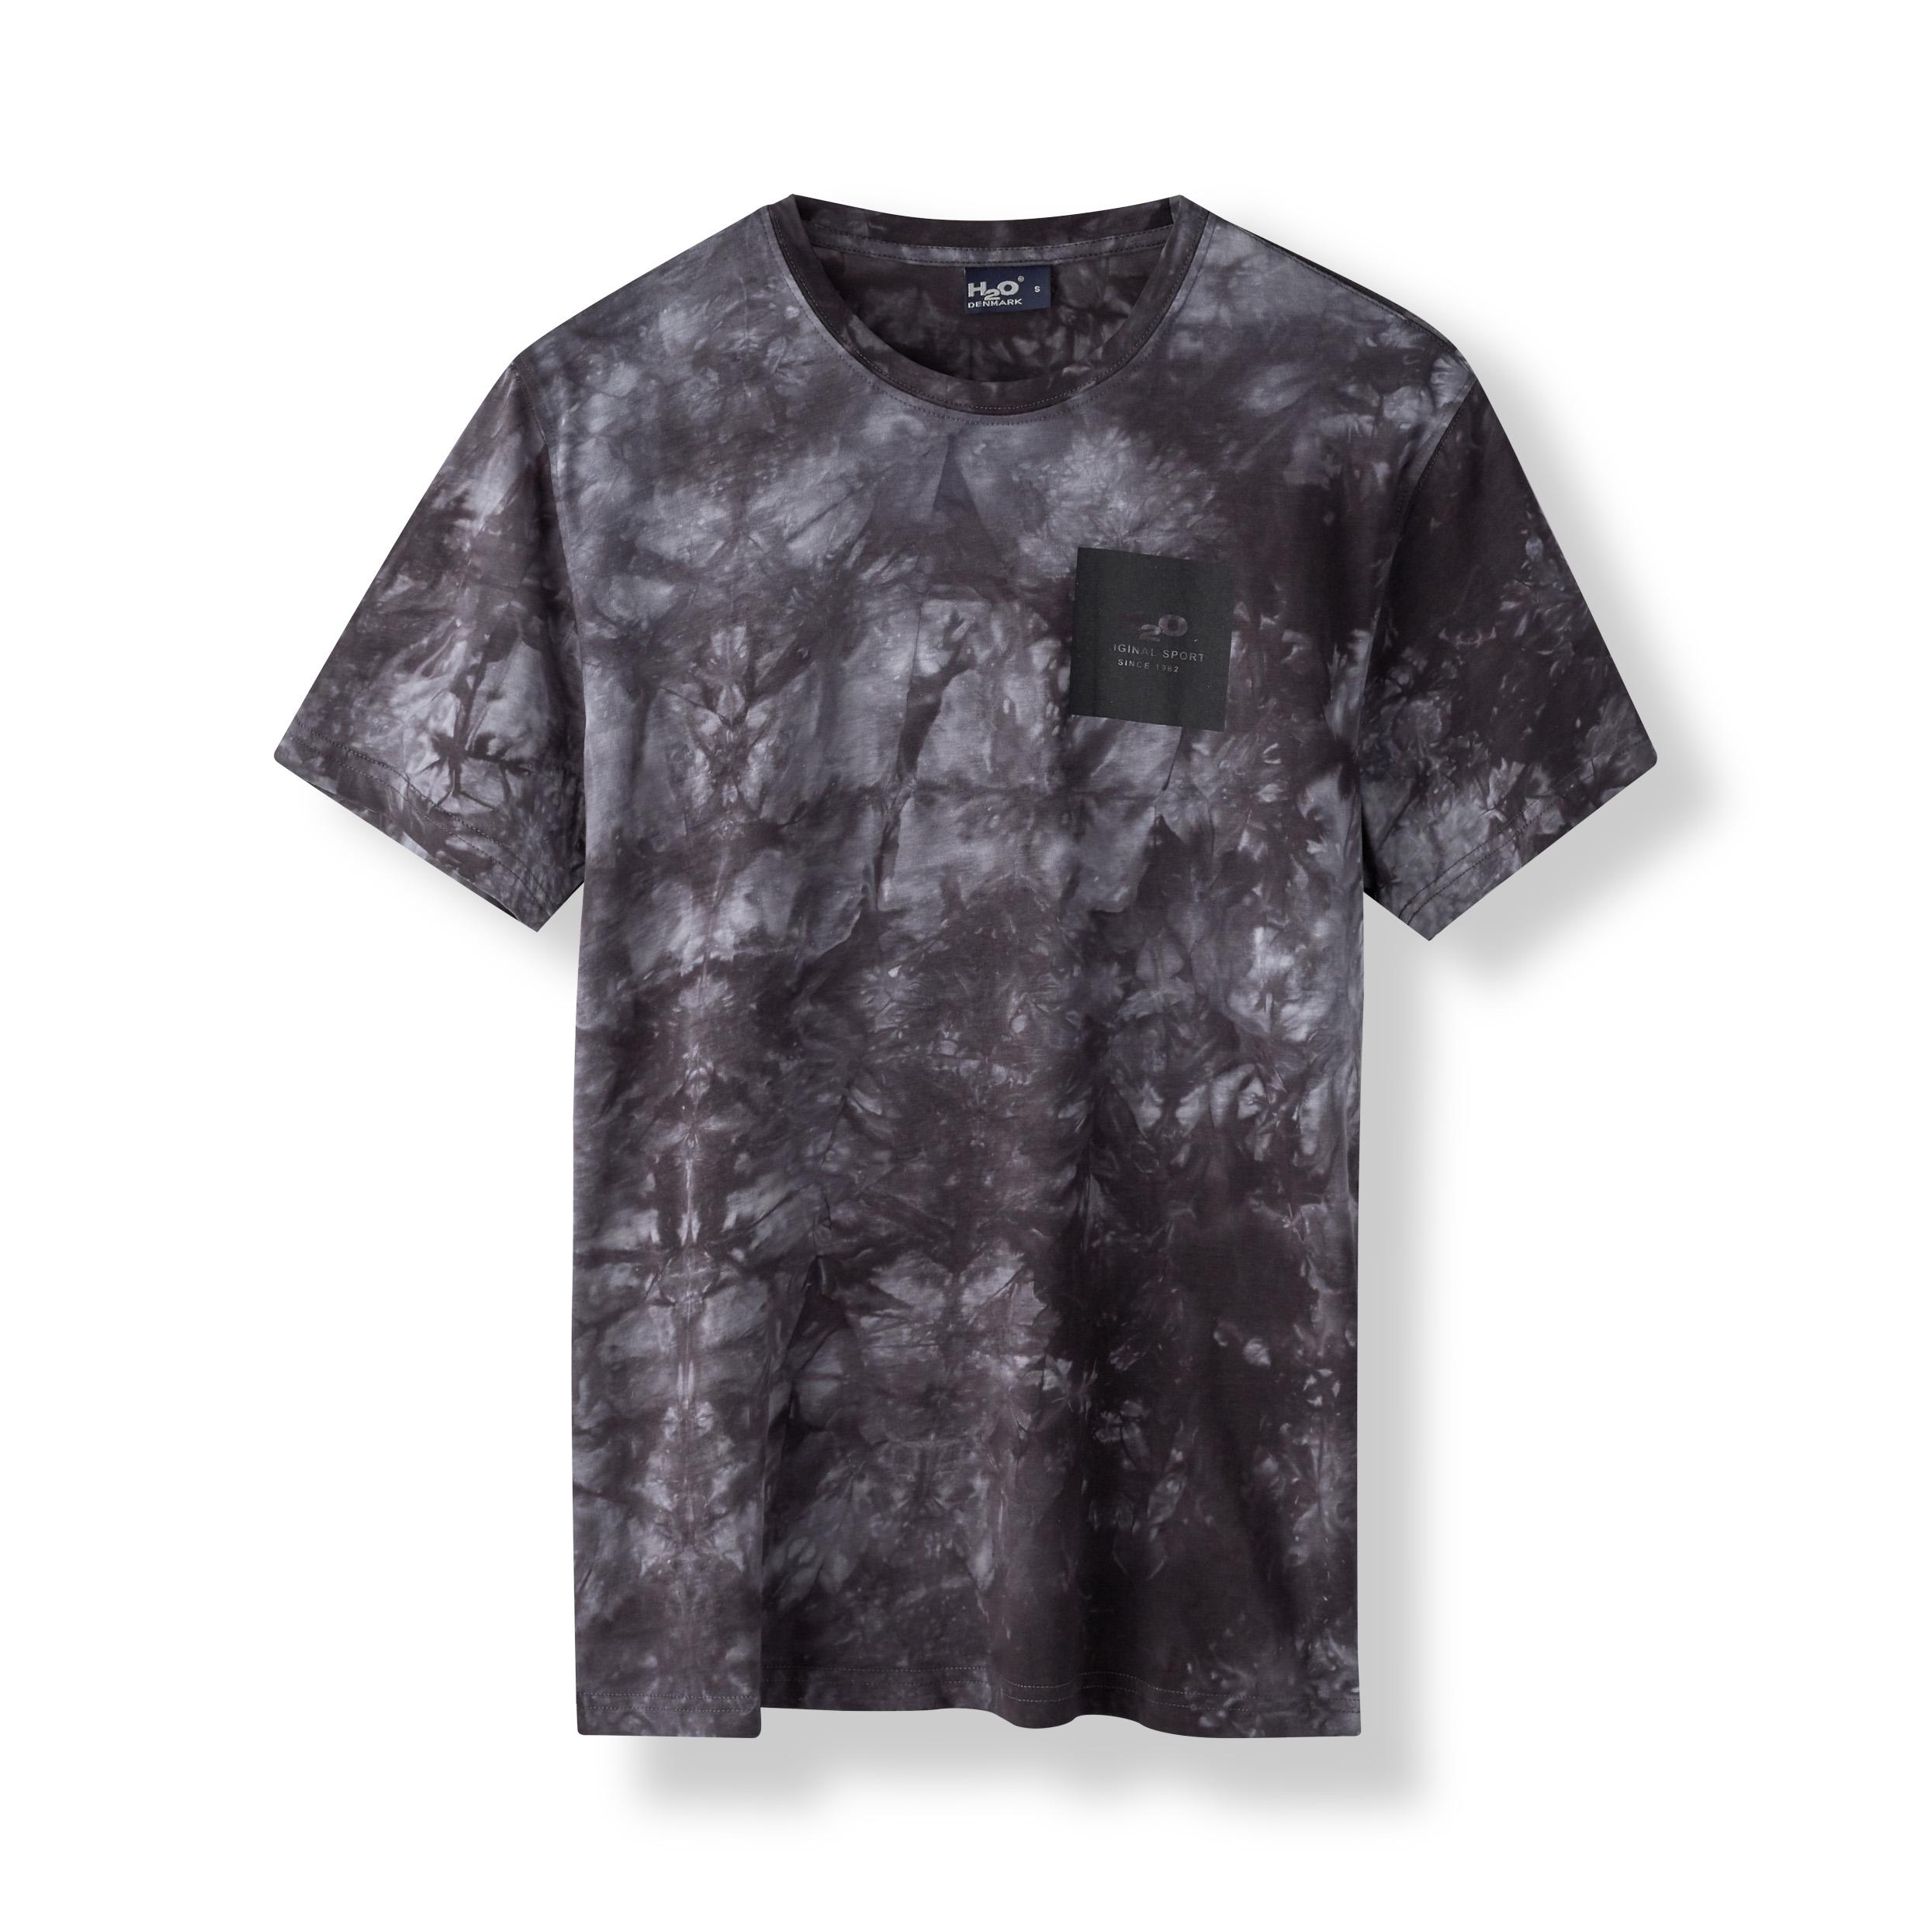 H2O Ribe Tie Dye t-shirt, black, small